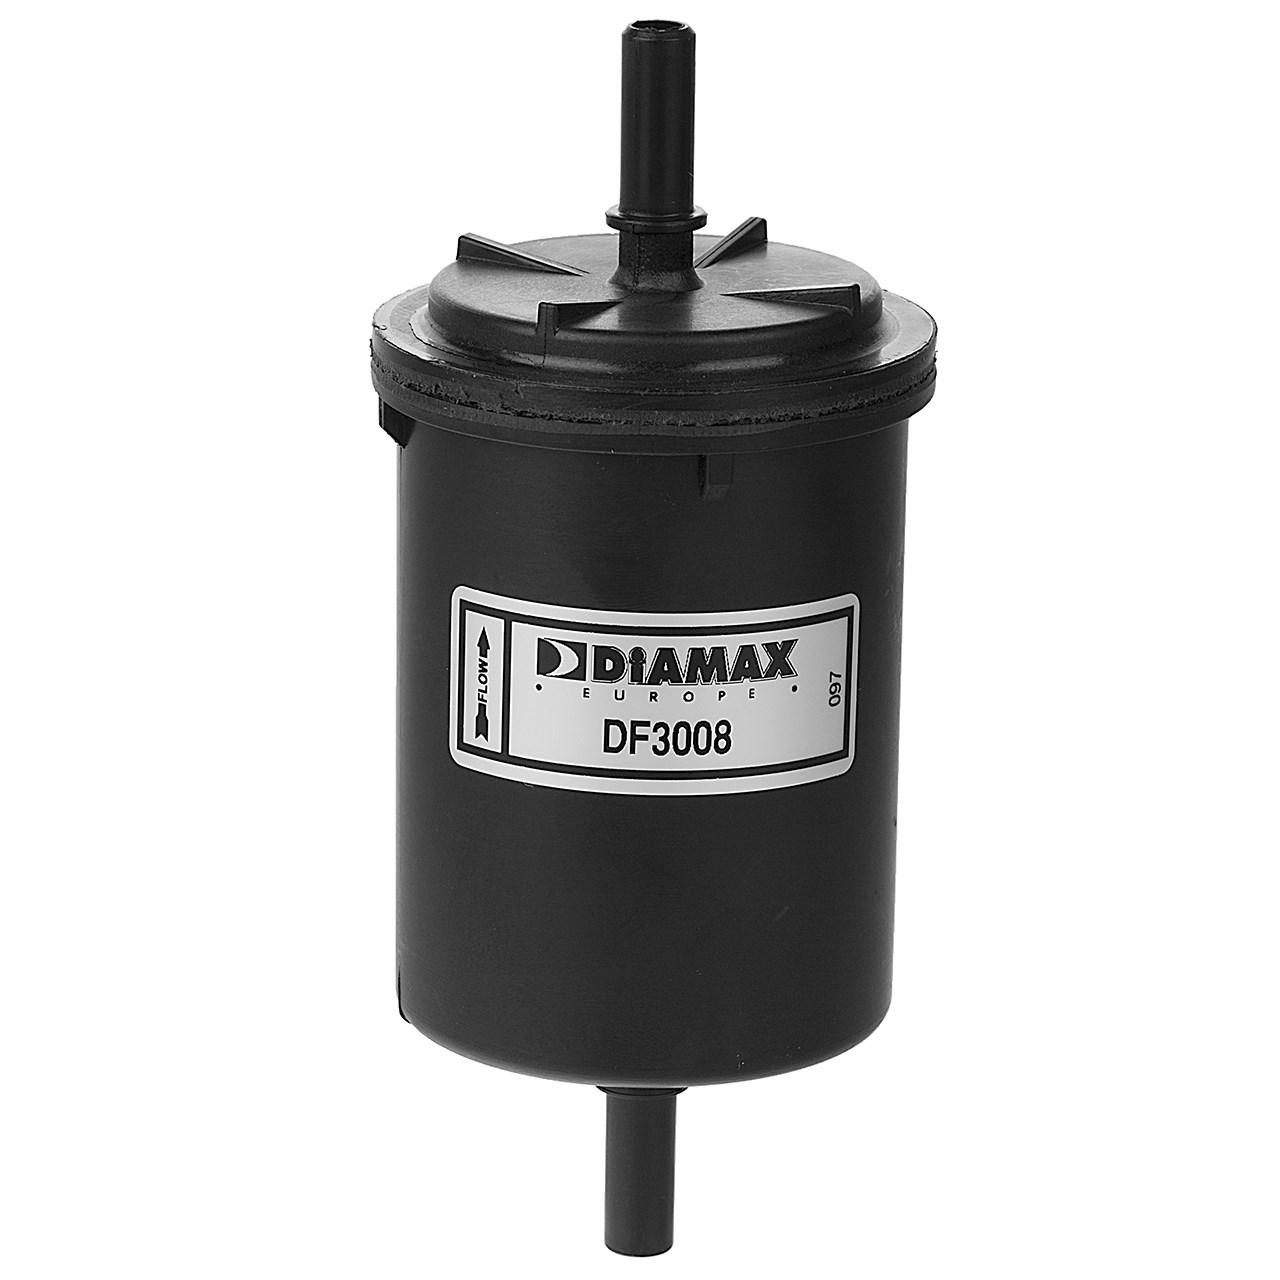 فیلتر سوخت دیامکس مدل DF3008